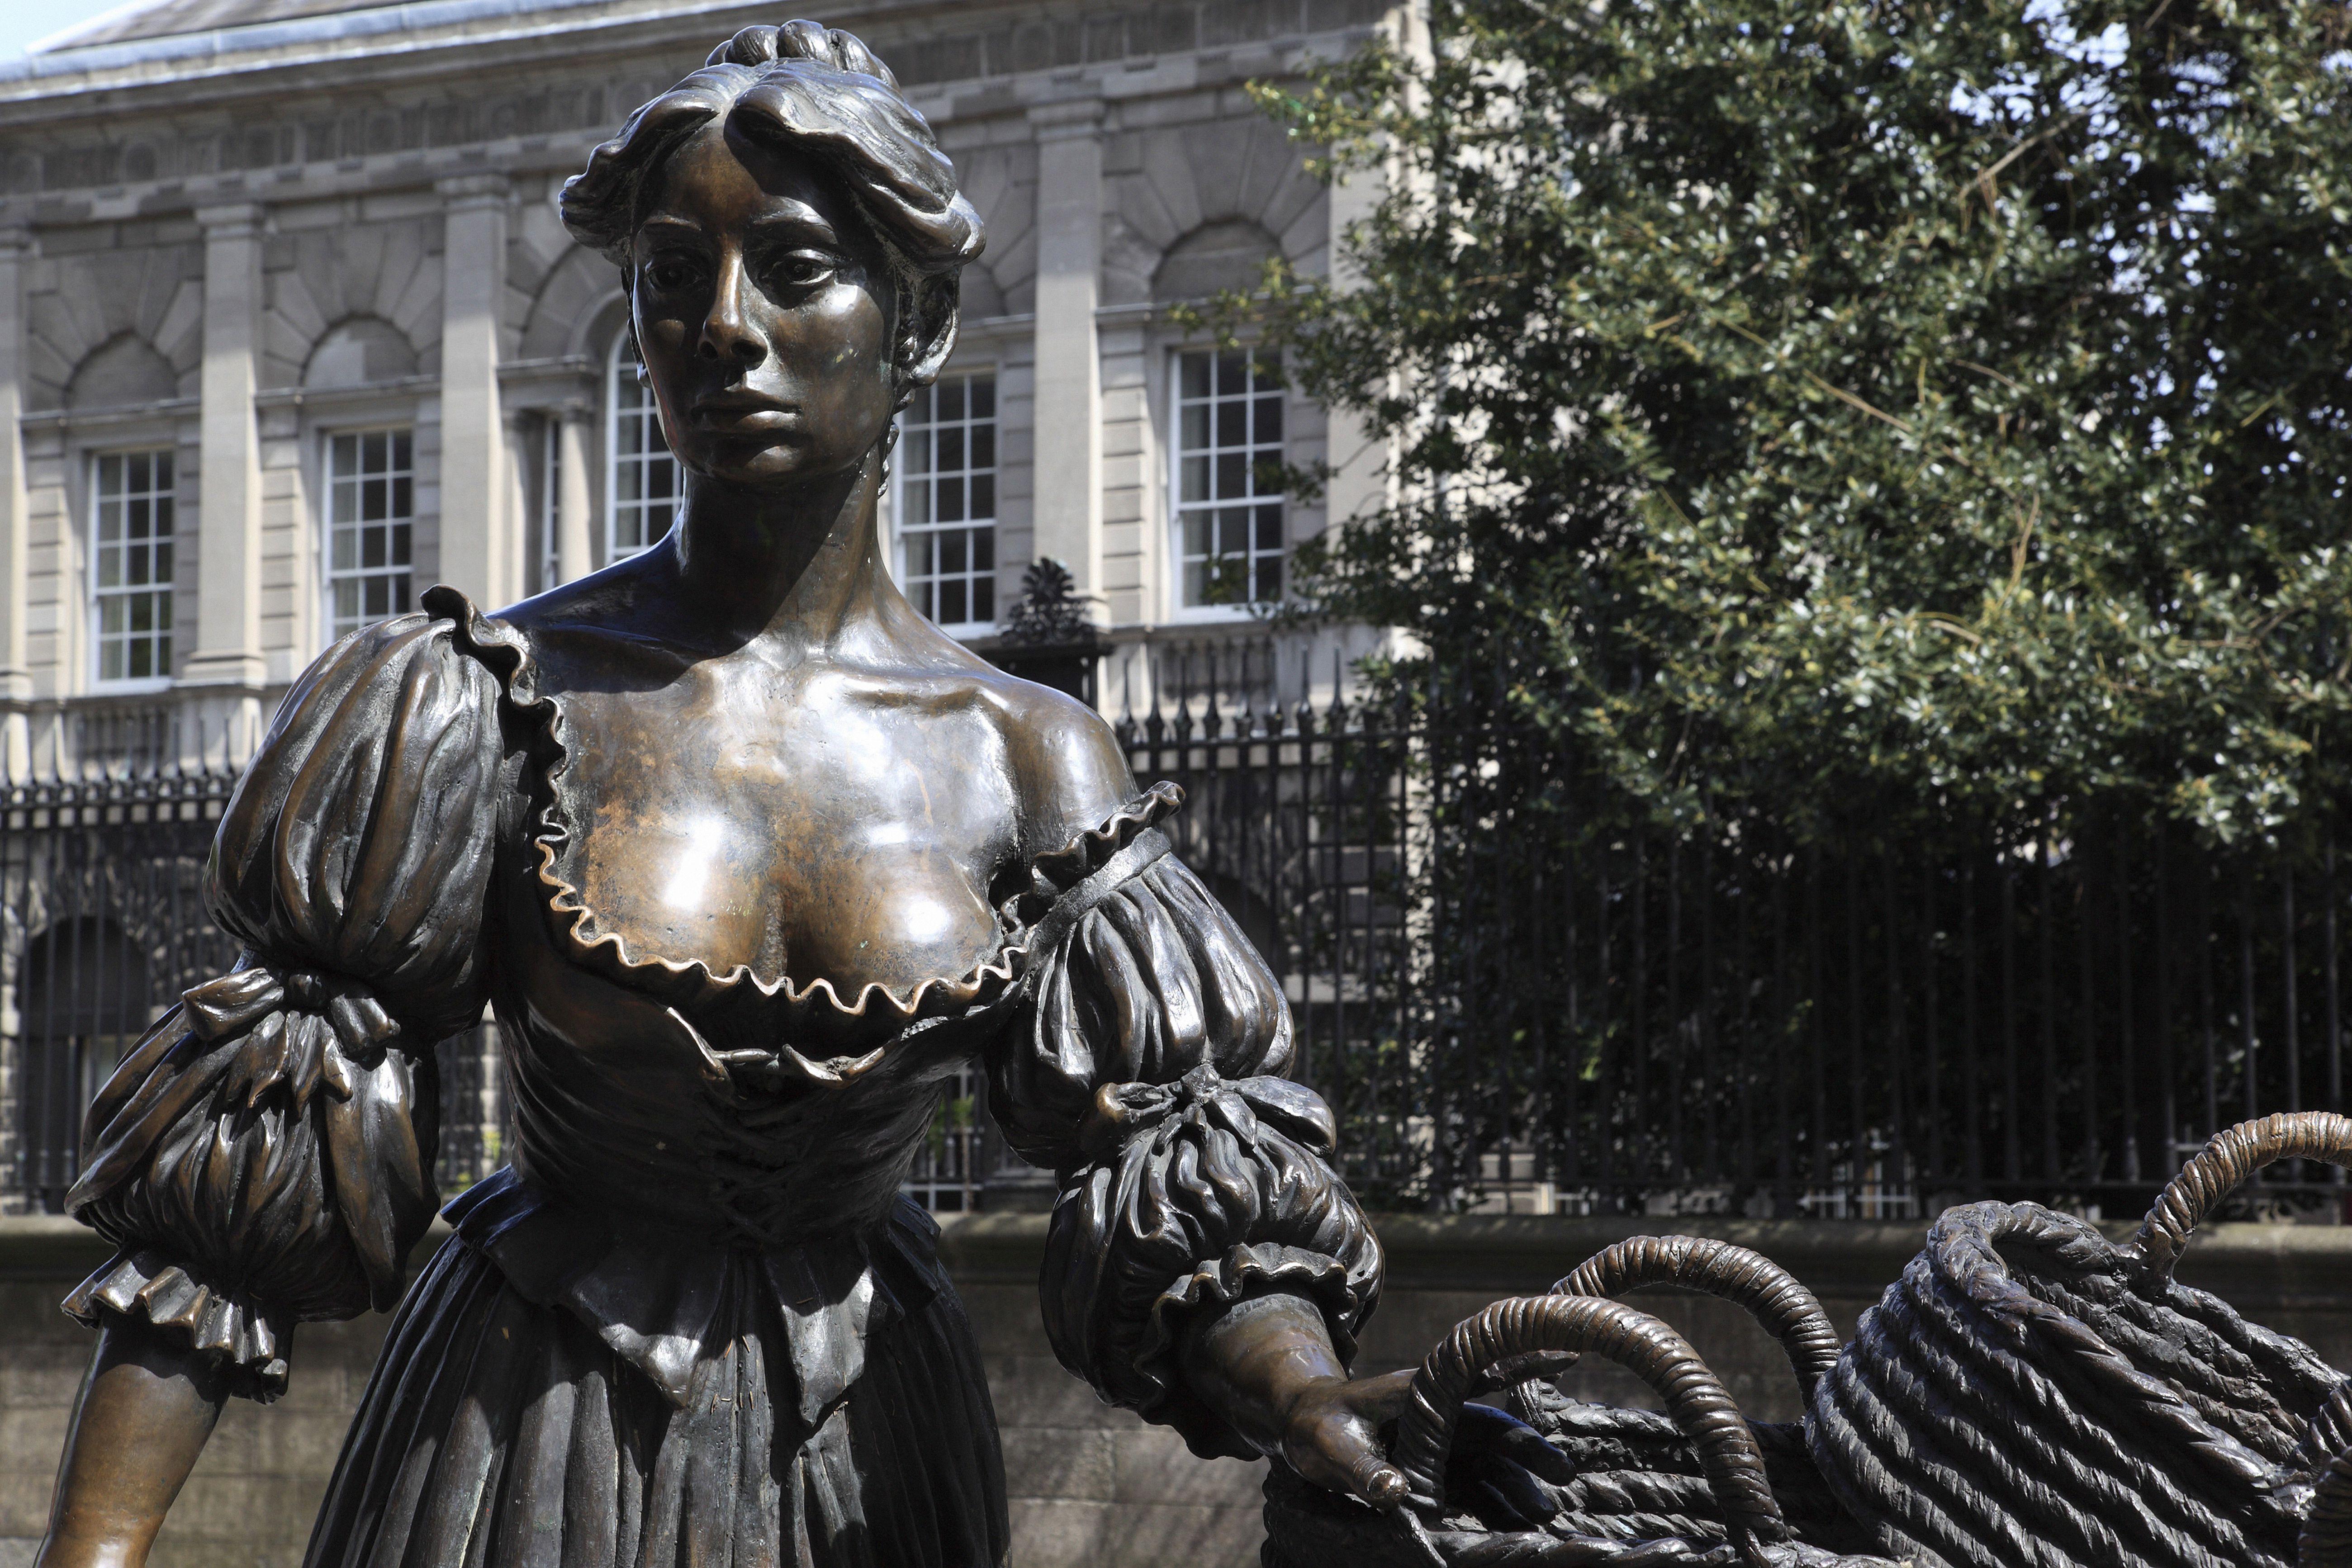 Molly Malone statue Dublin County Dublin IrelandTRAVEL STOCK